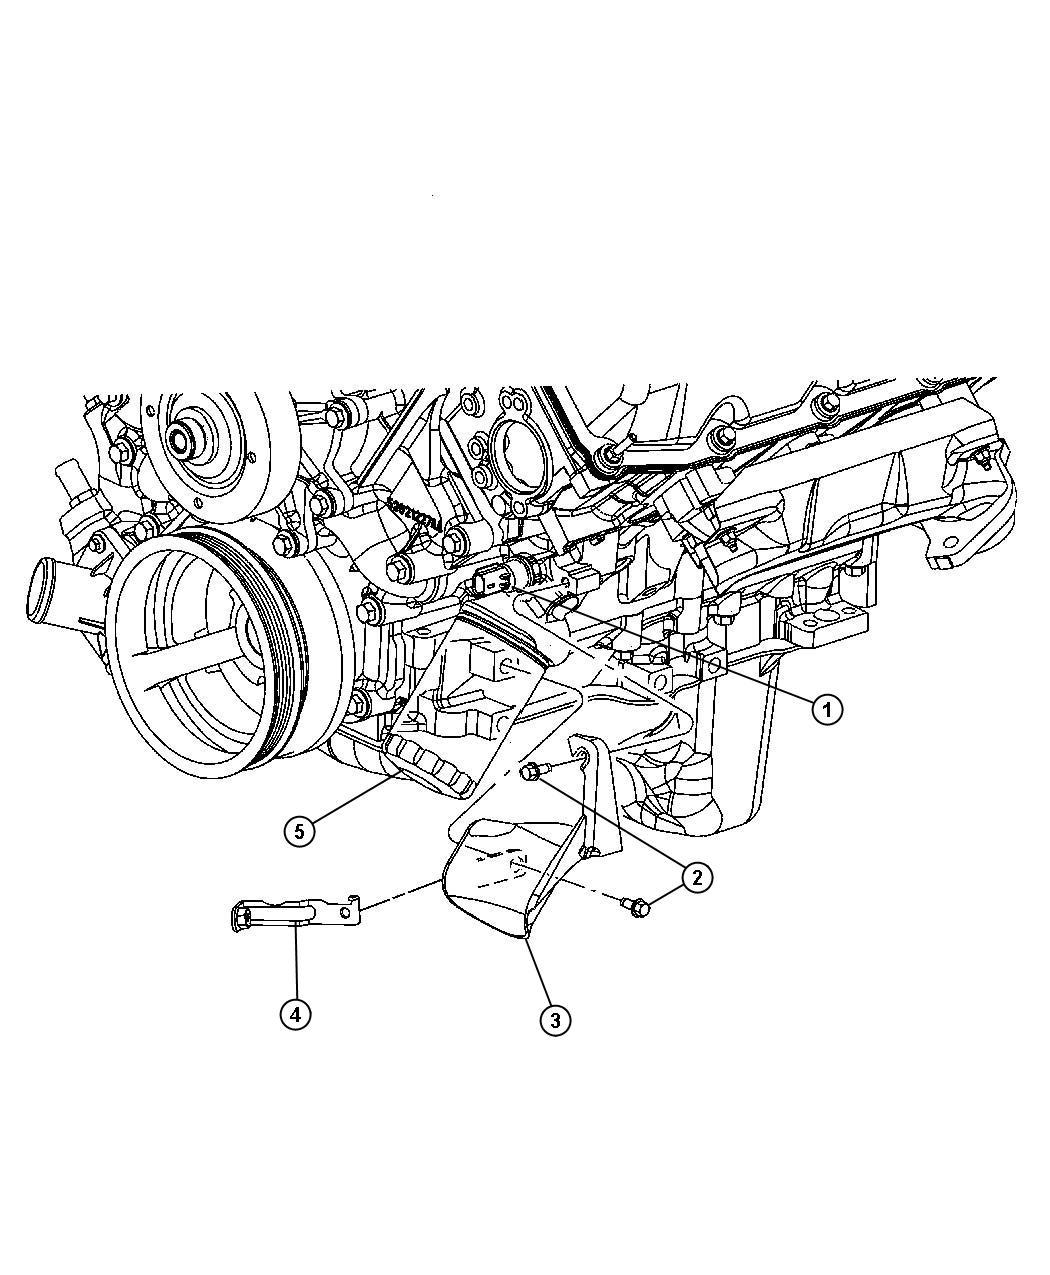 Jeep Grand Cherokee Laredo 4x4 4 7l V8 Ffv 5 Spd Automatic 545rfe Oil Filter And Splash Guard